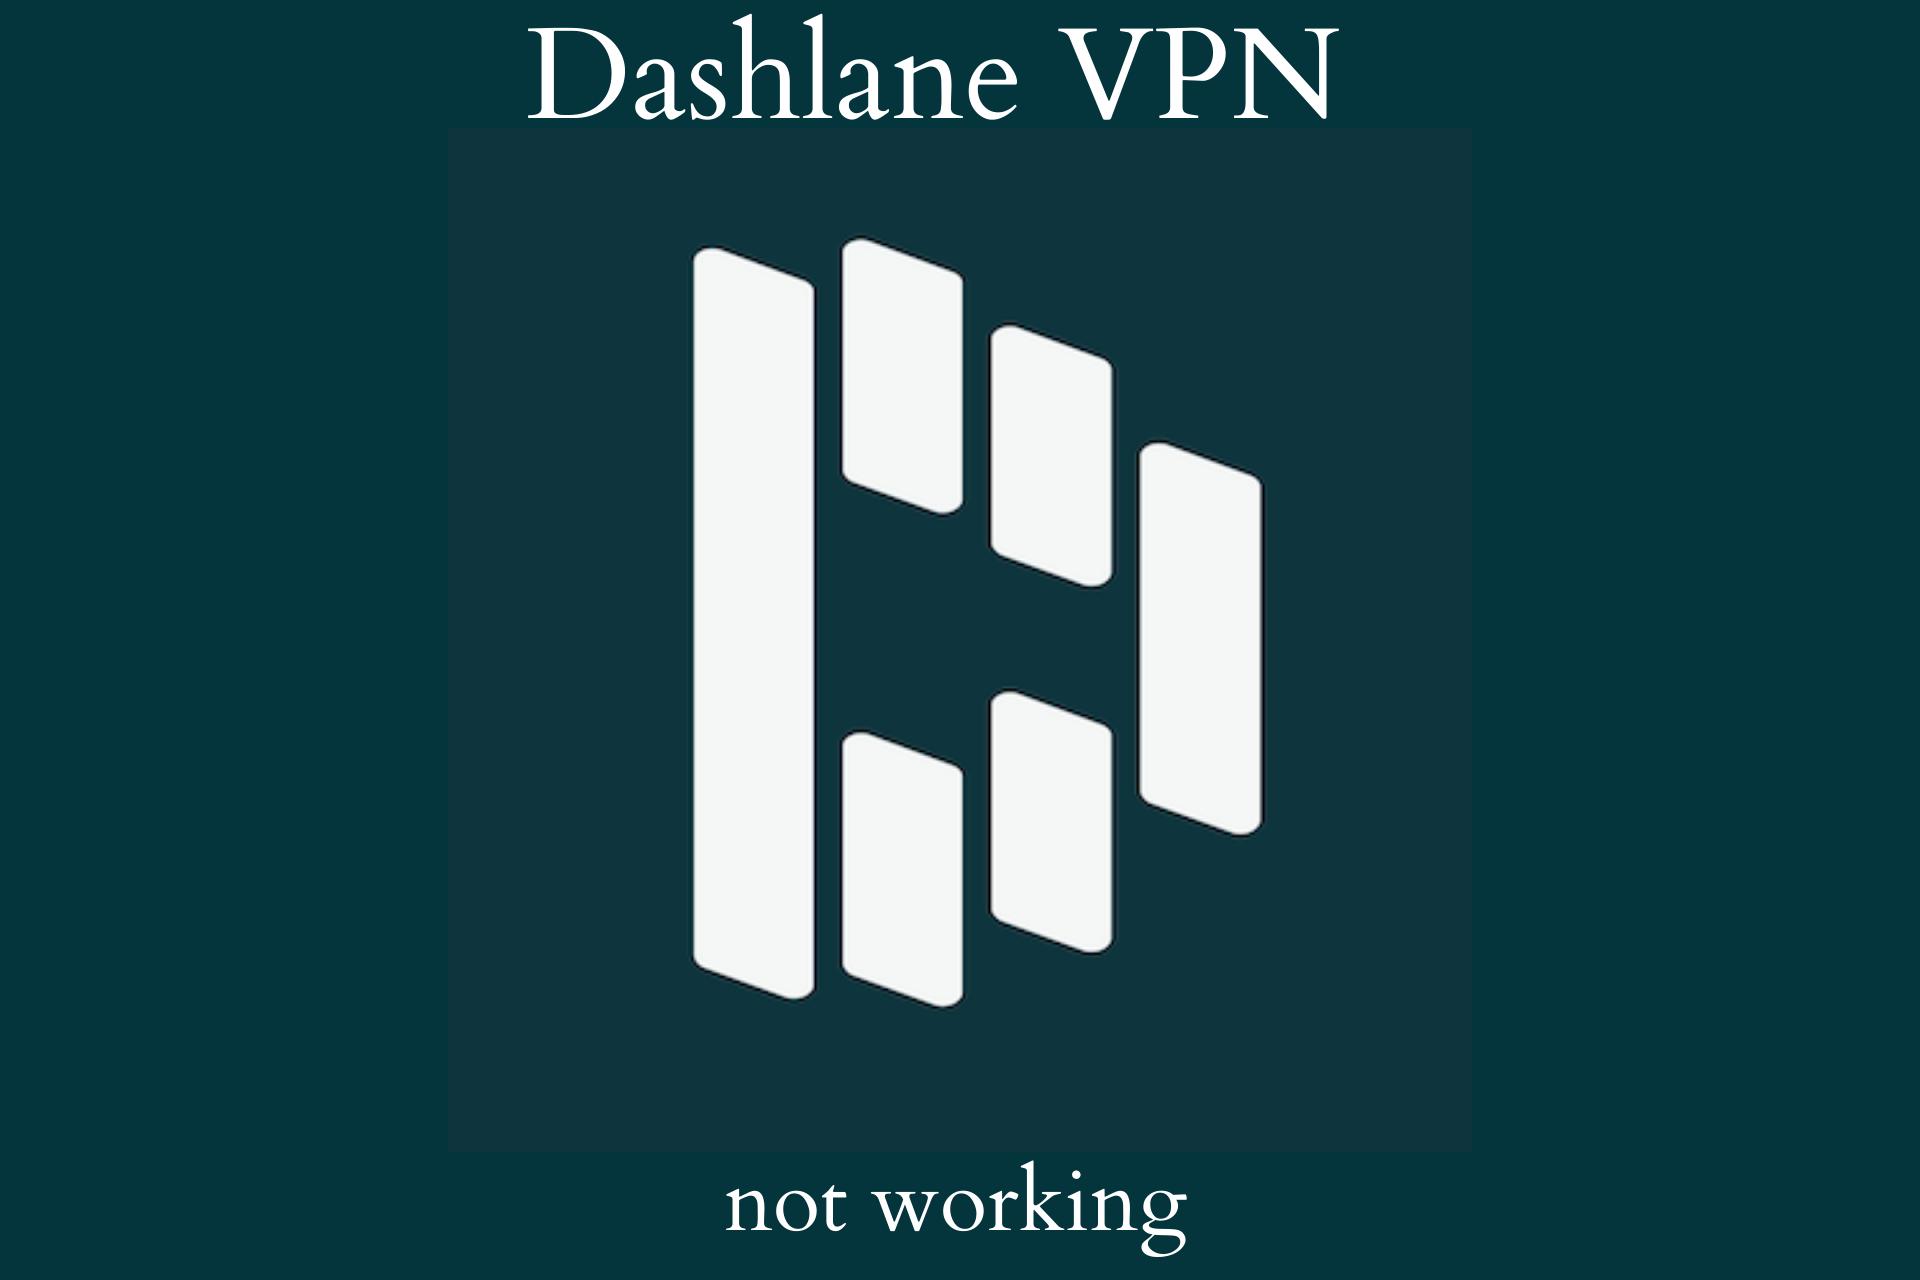 Fix Dashlane VPN not working